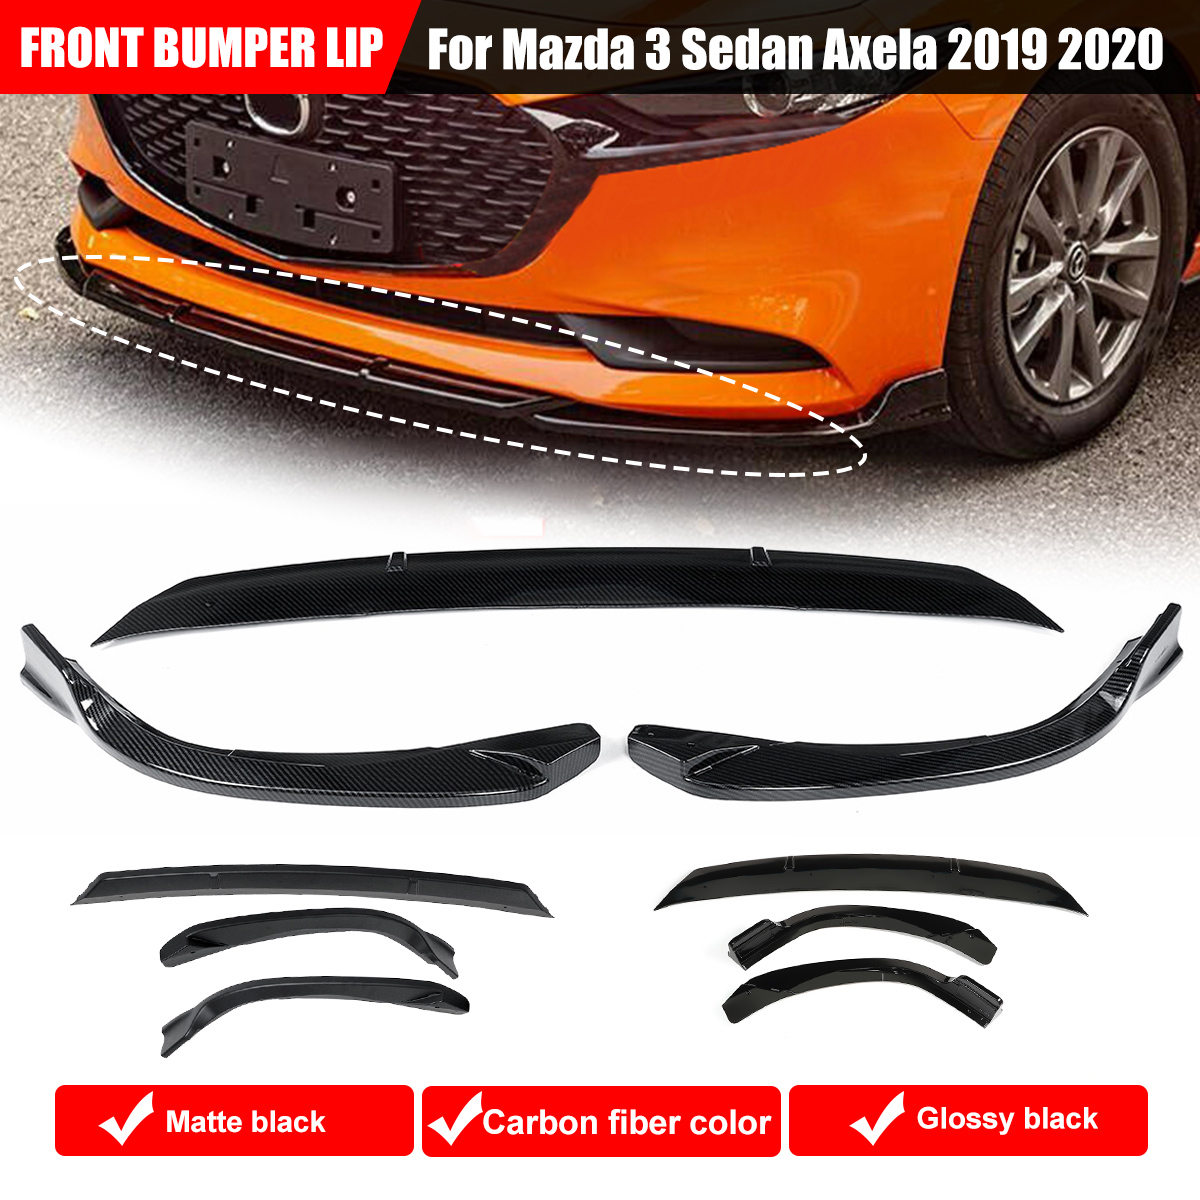 Front Bumper Lip Body Protector Cover Kit Spoiler Exterior Parts For Mazda 3 Sedan Axela Sedan 2019 2020|Bumpers| |  - title=